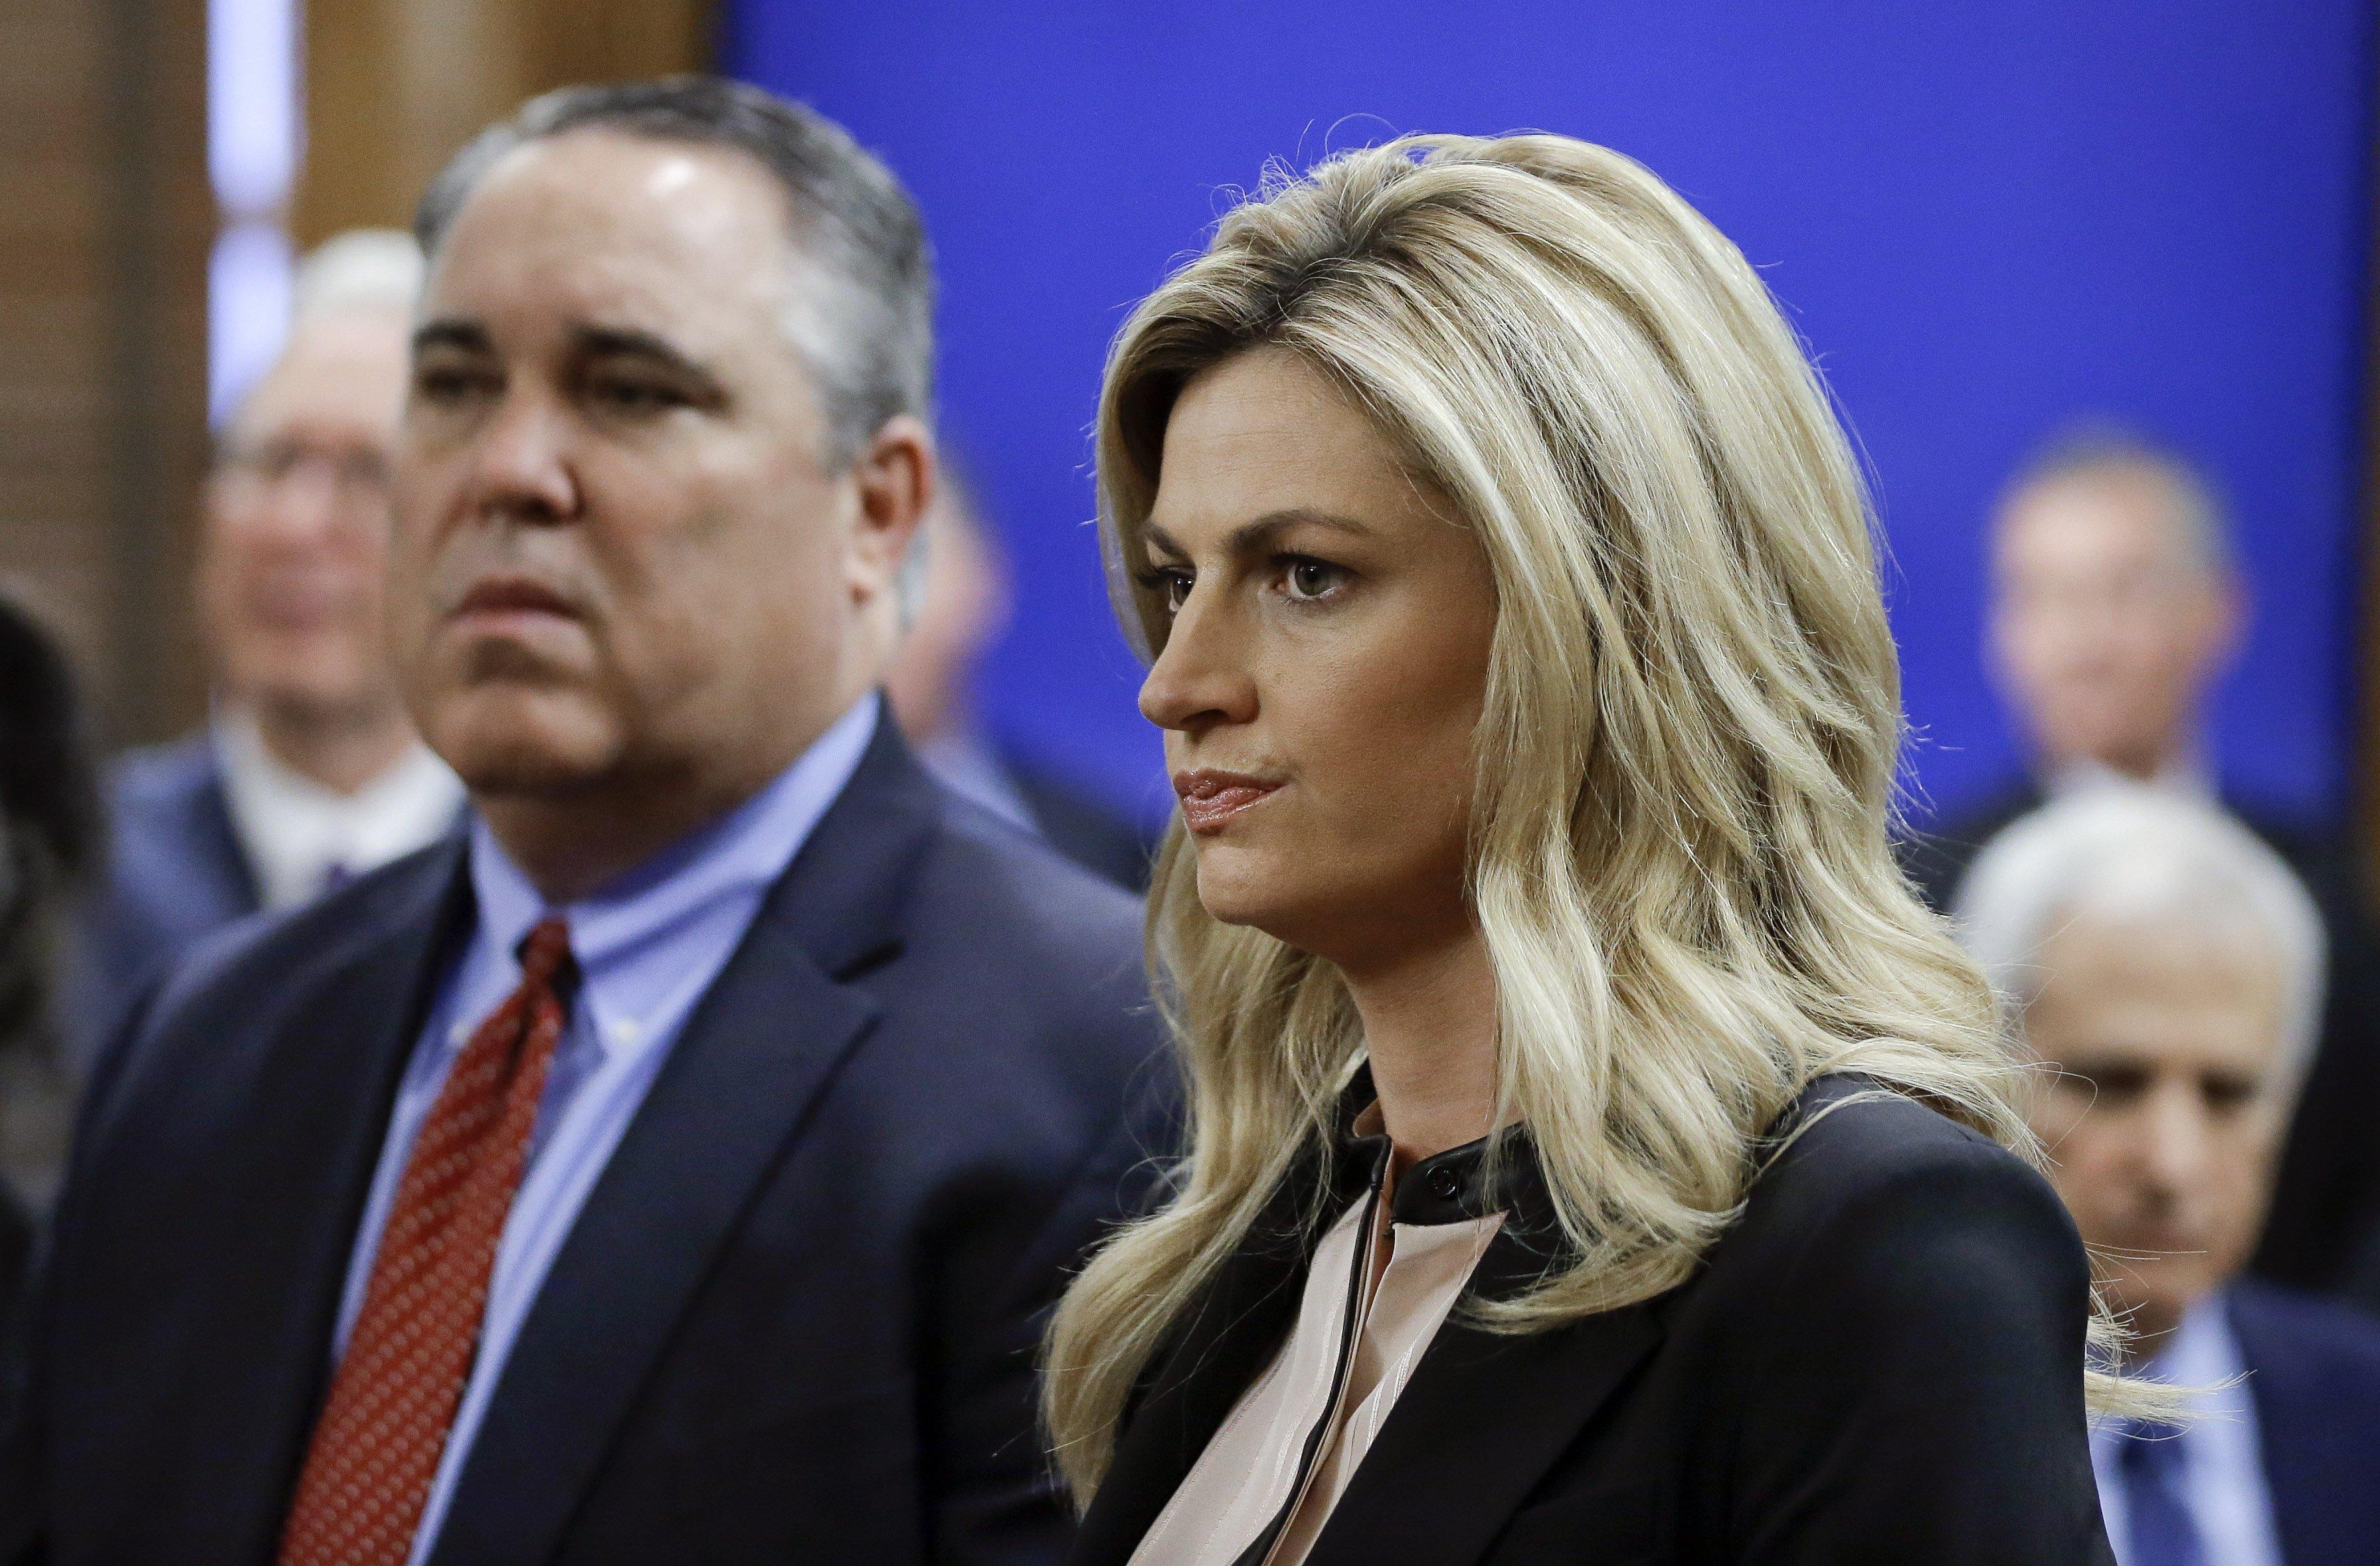 Sportscaster Erin Andrews Tearfully Tells of Shock Over